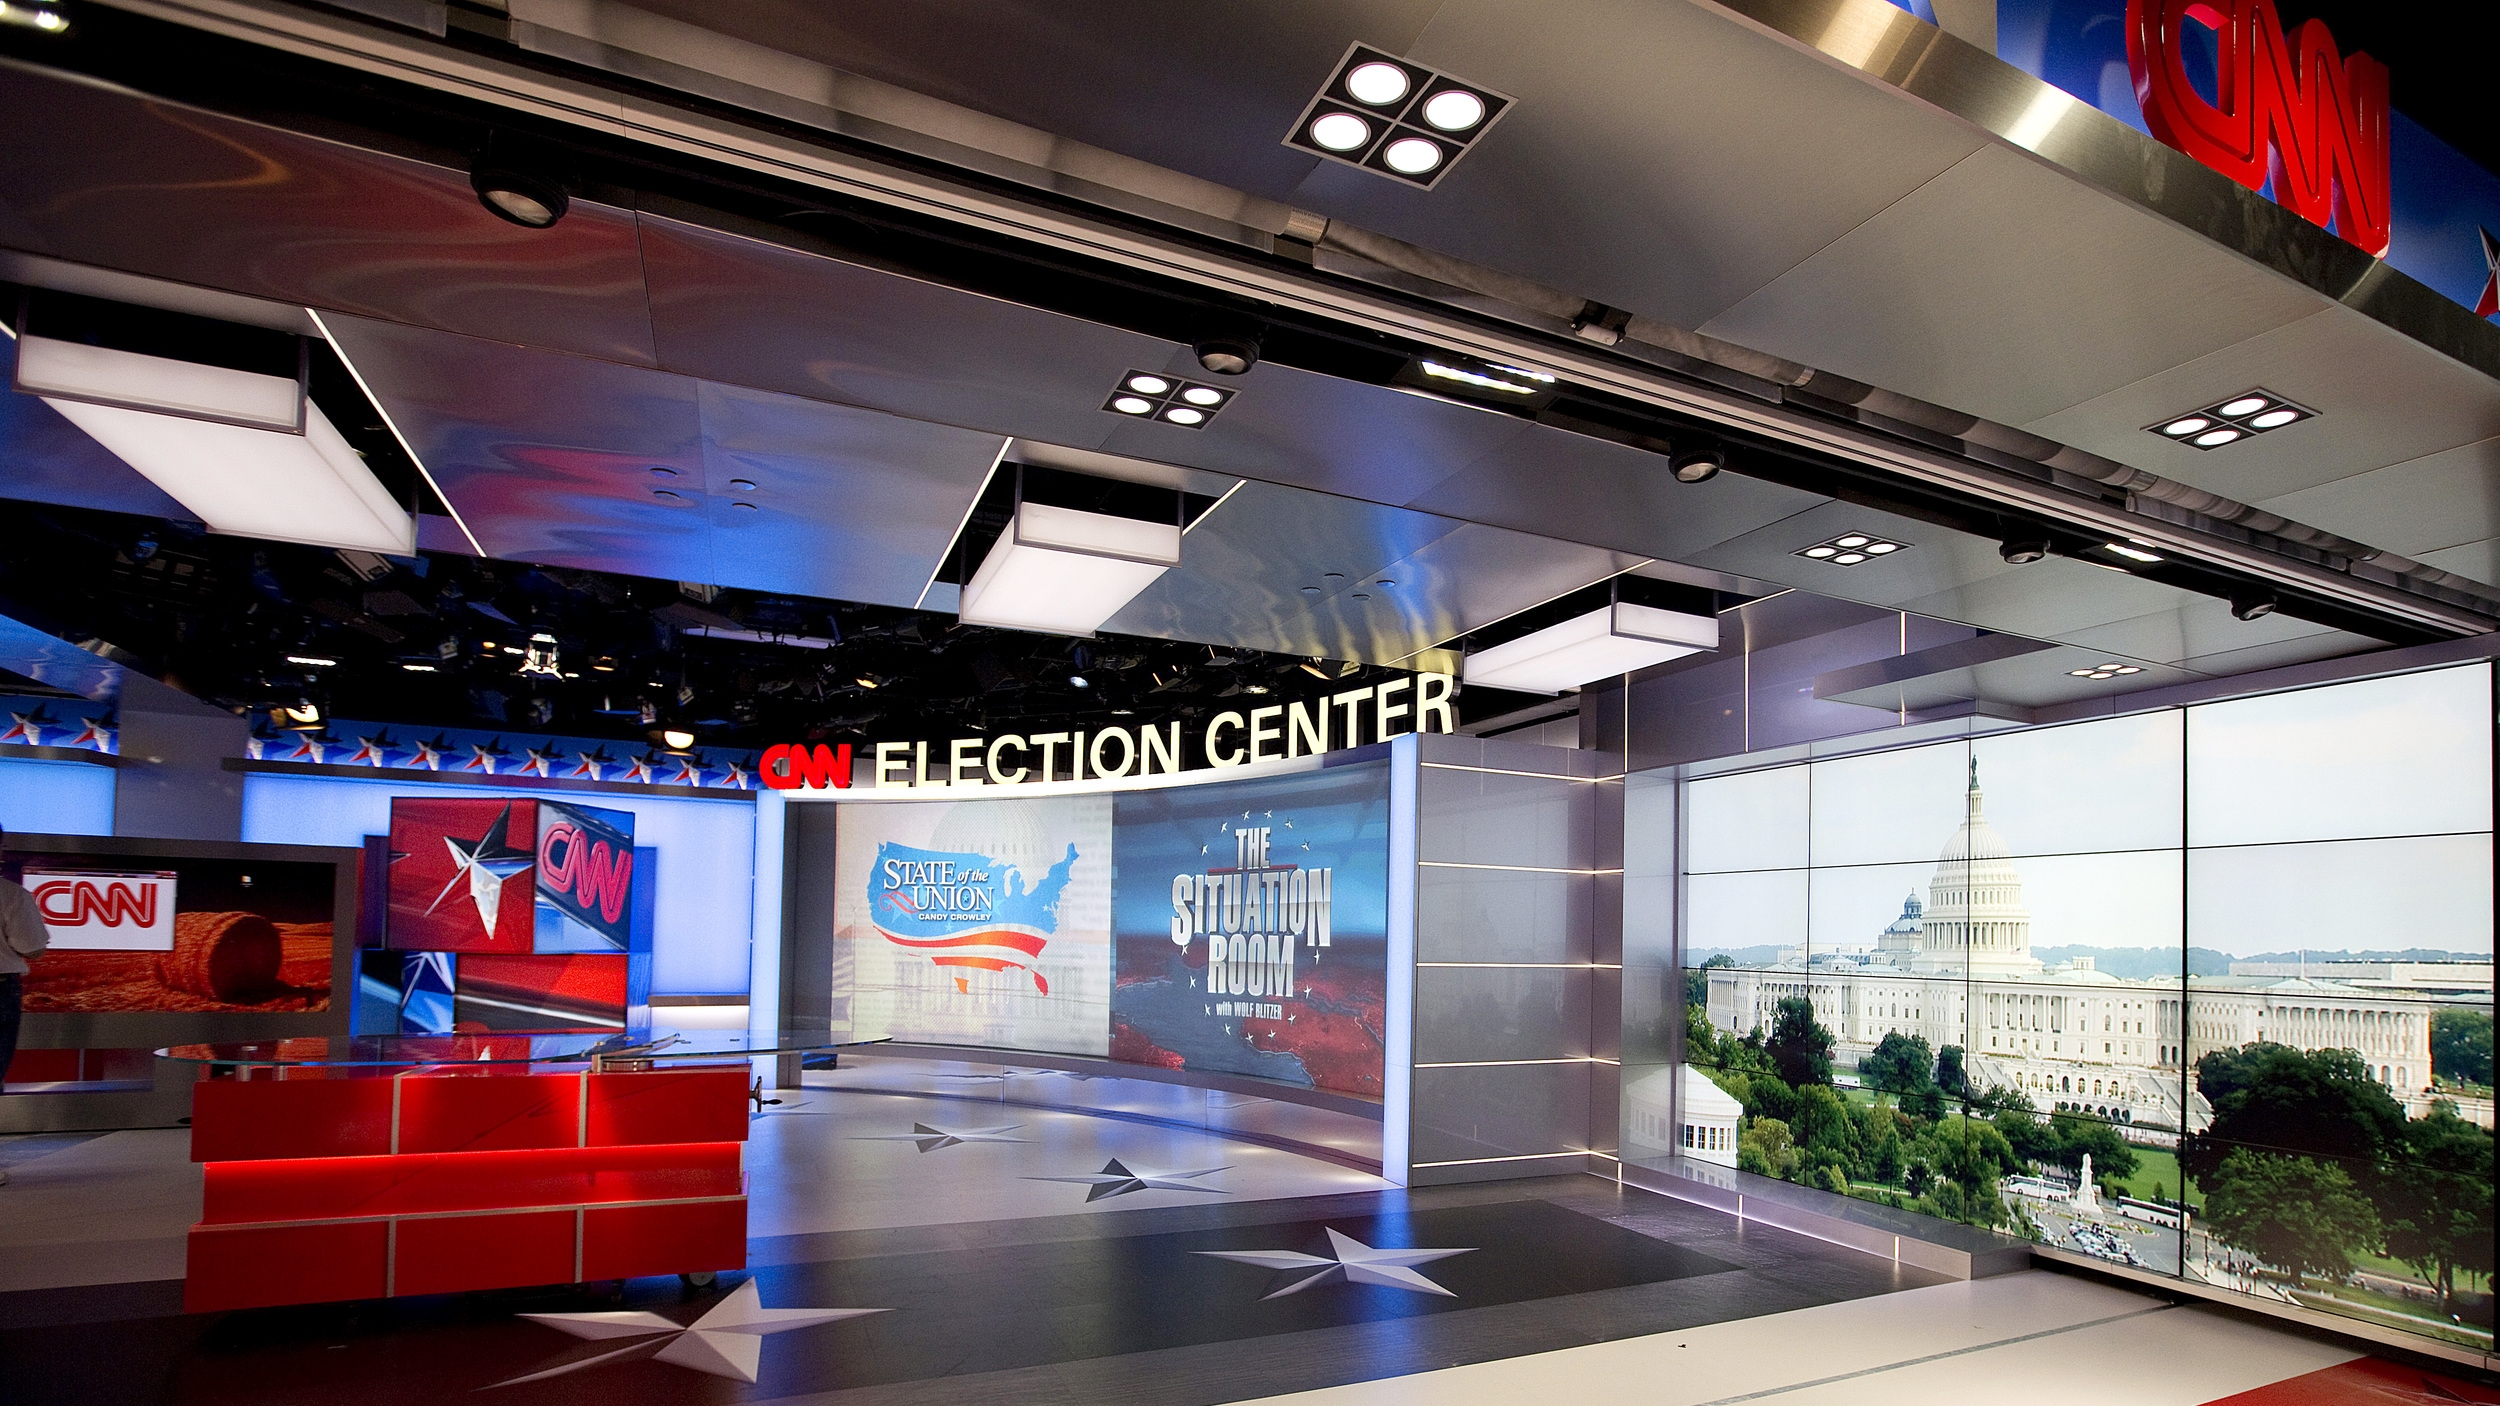 cnn_wdc_election_center19.JPG